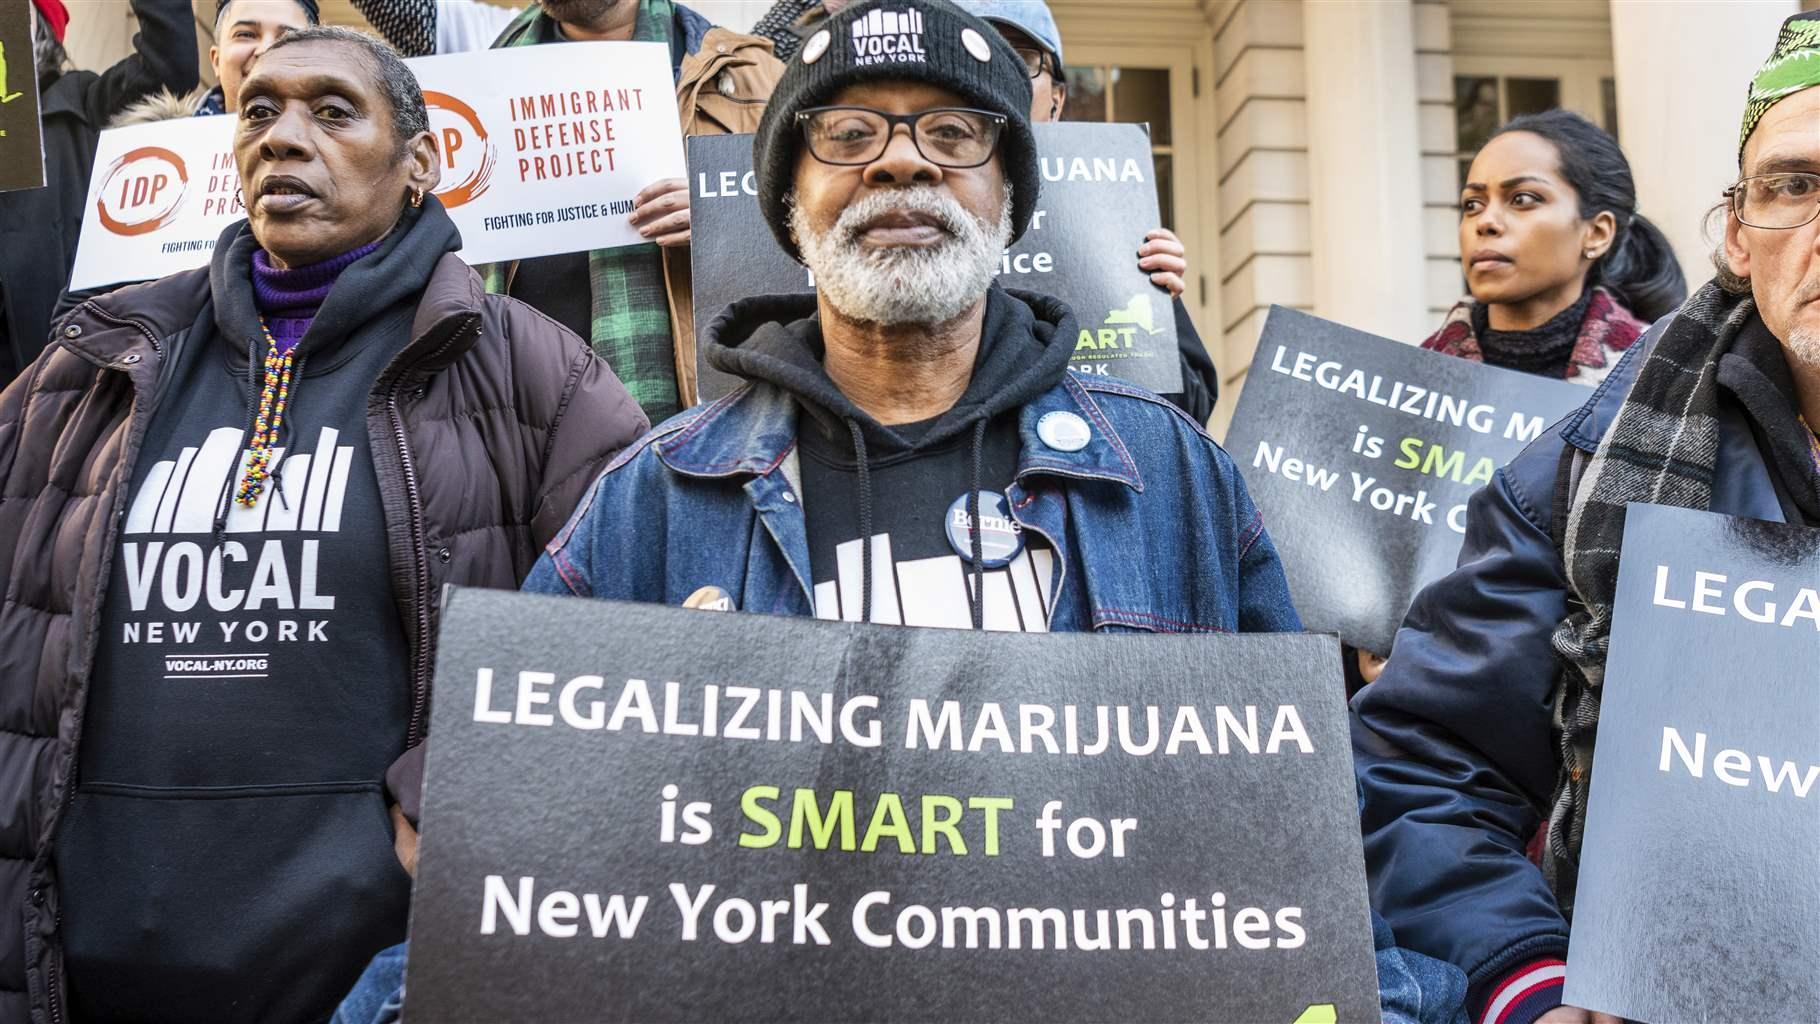 Policing Protests Propel Marijuana Decriminalization Efforts | The Pew  Charitable Trusts